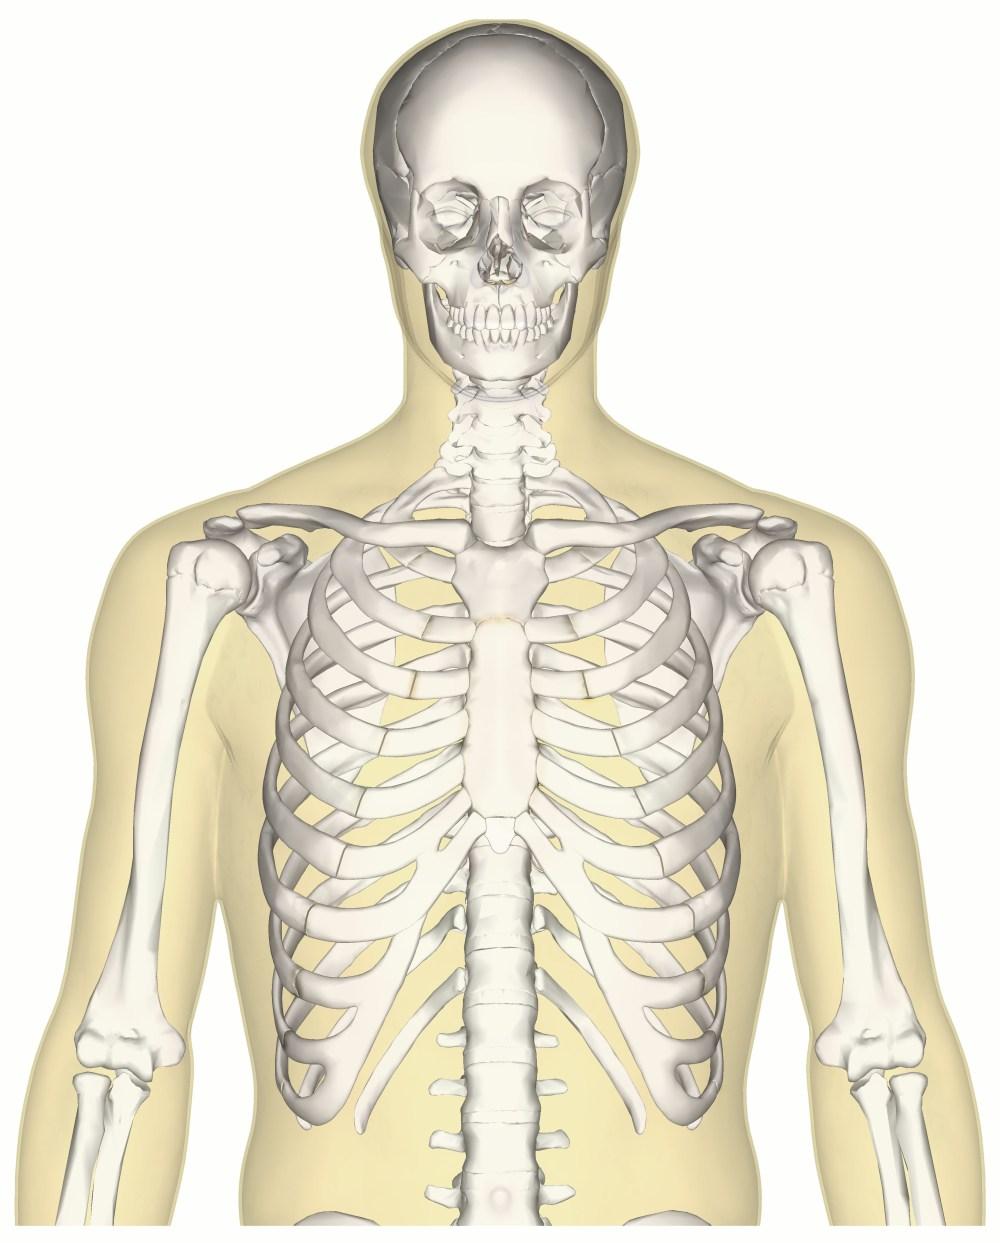 medium resolution of file human skeleton upper body anterior view jpg